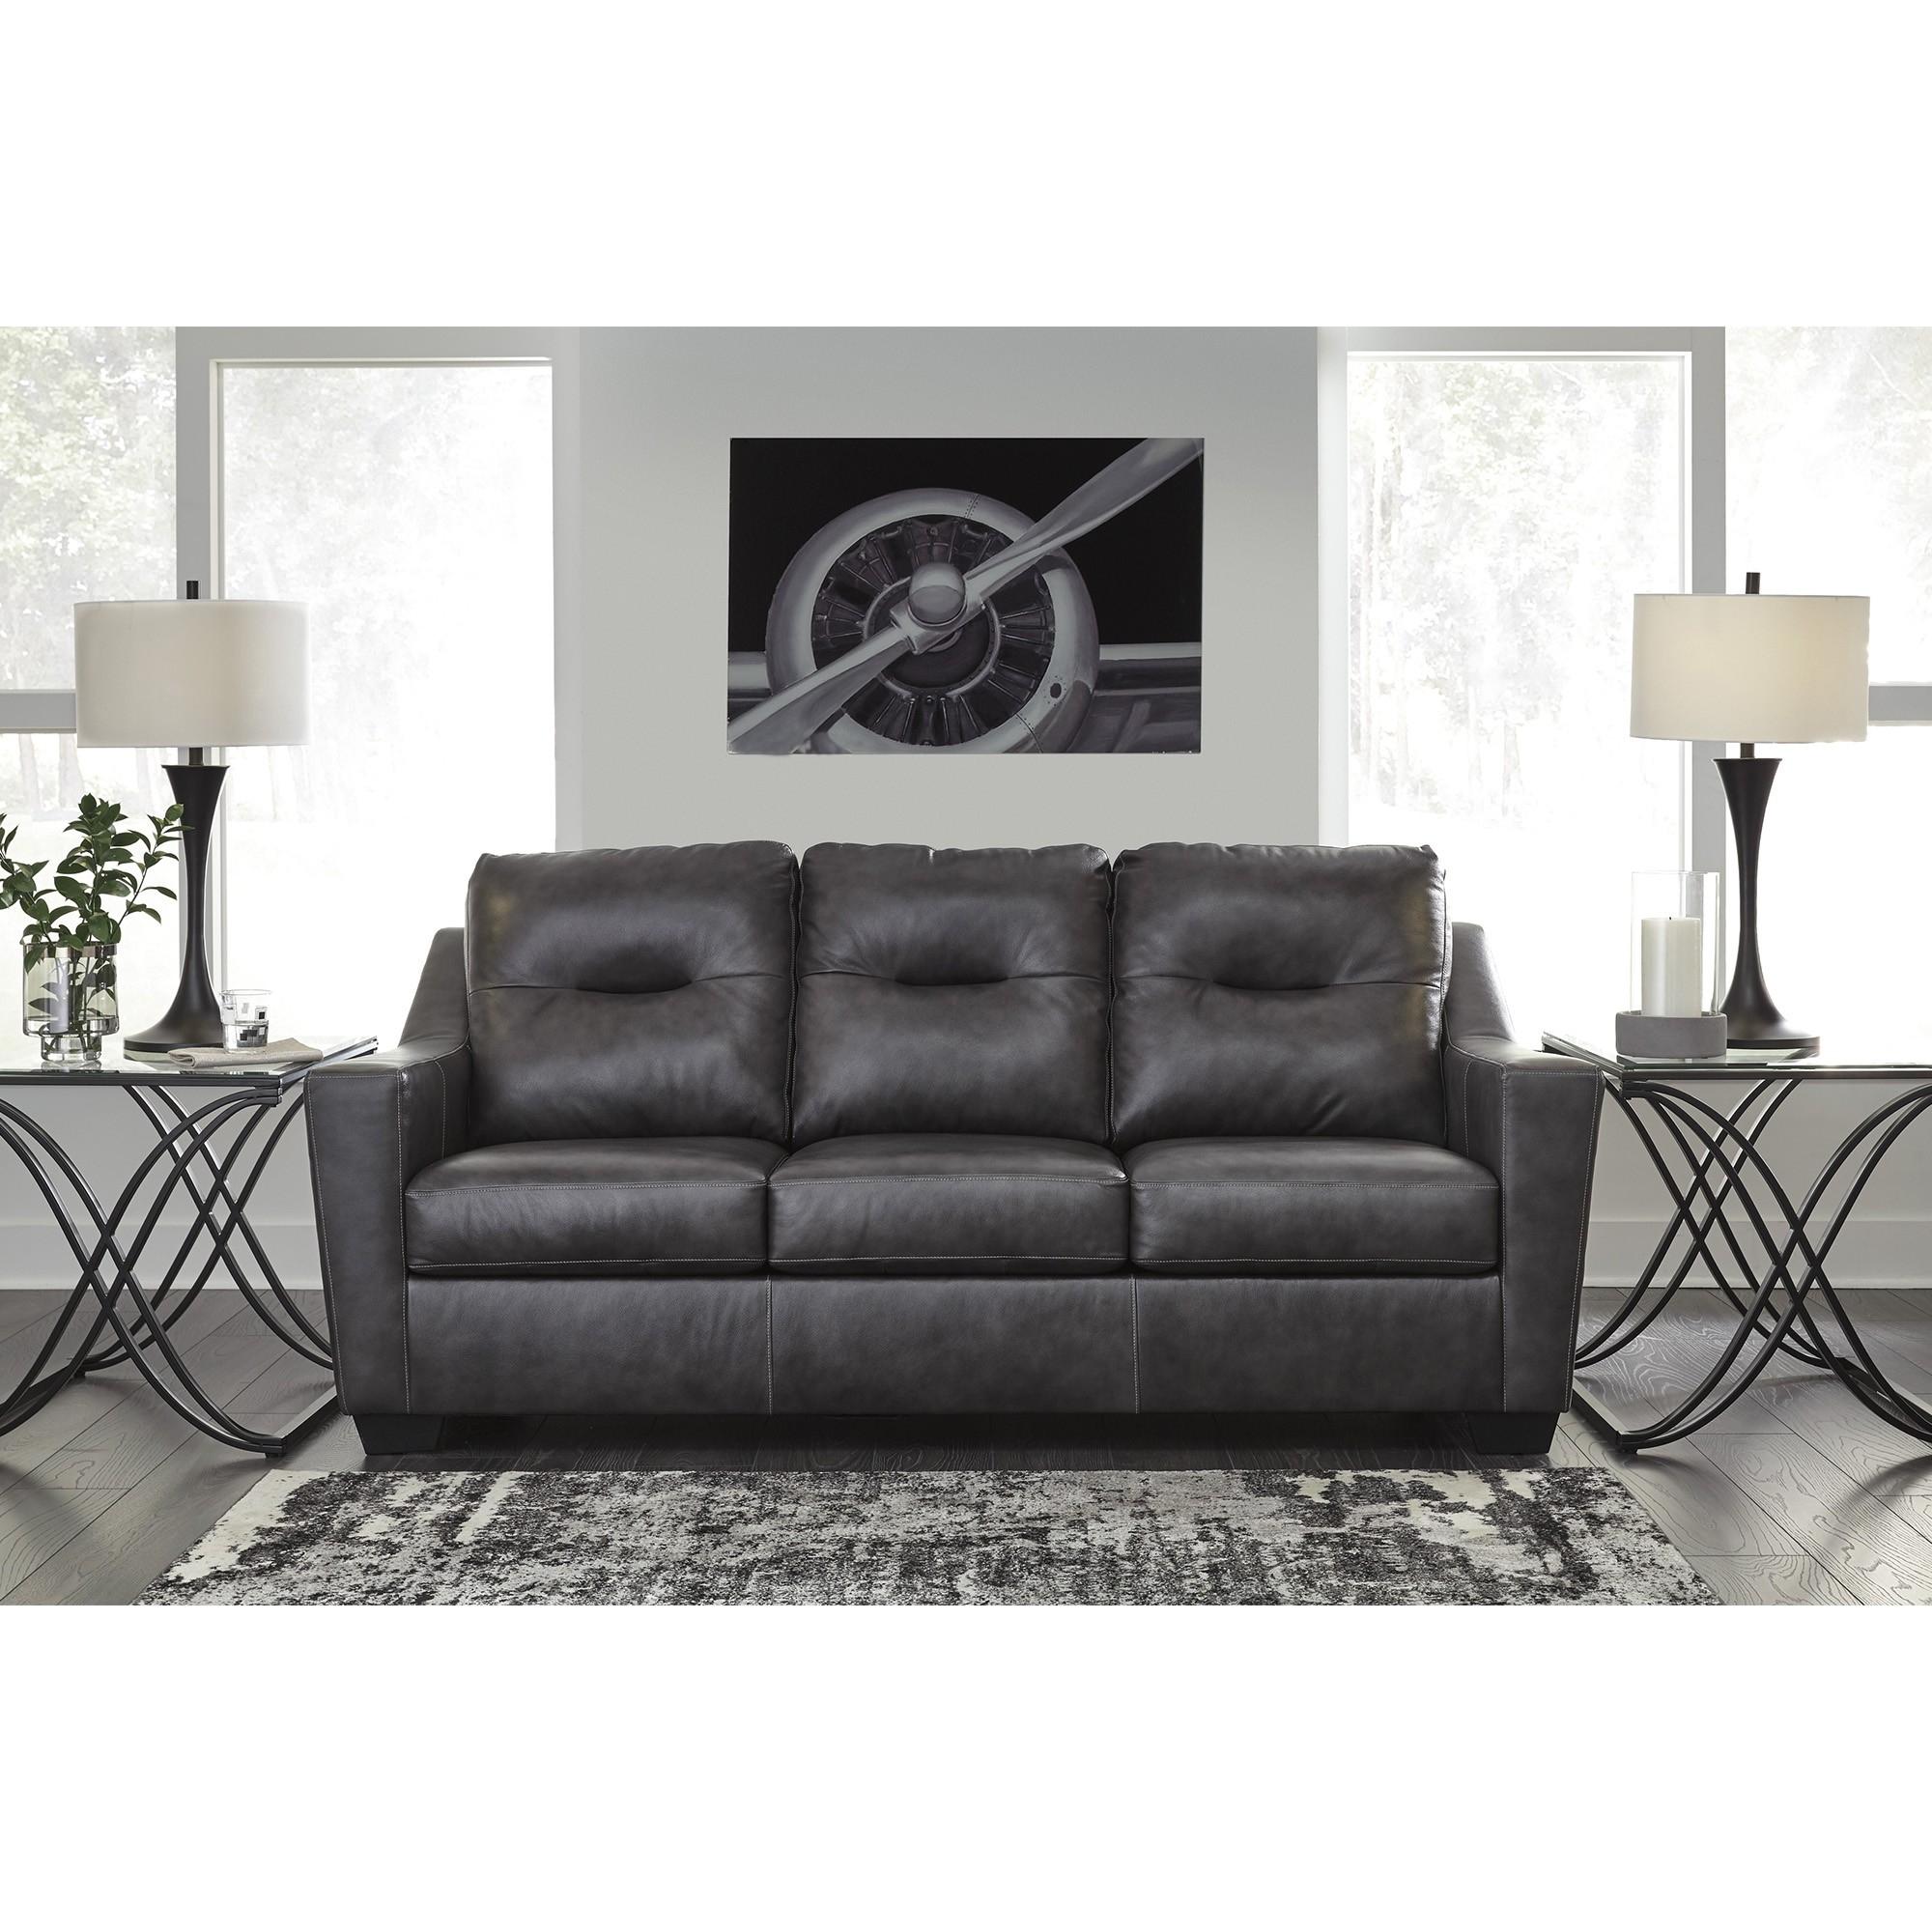 Trendy Kensbridge Sofa – Charcoal (View 7 of 15)